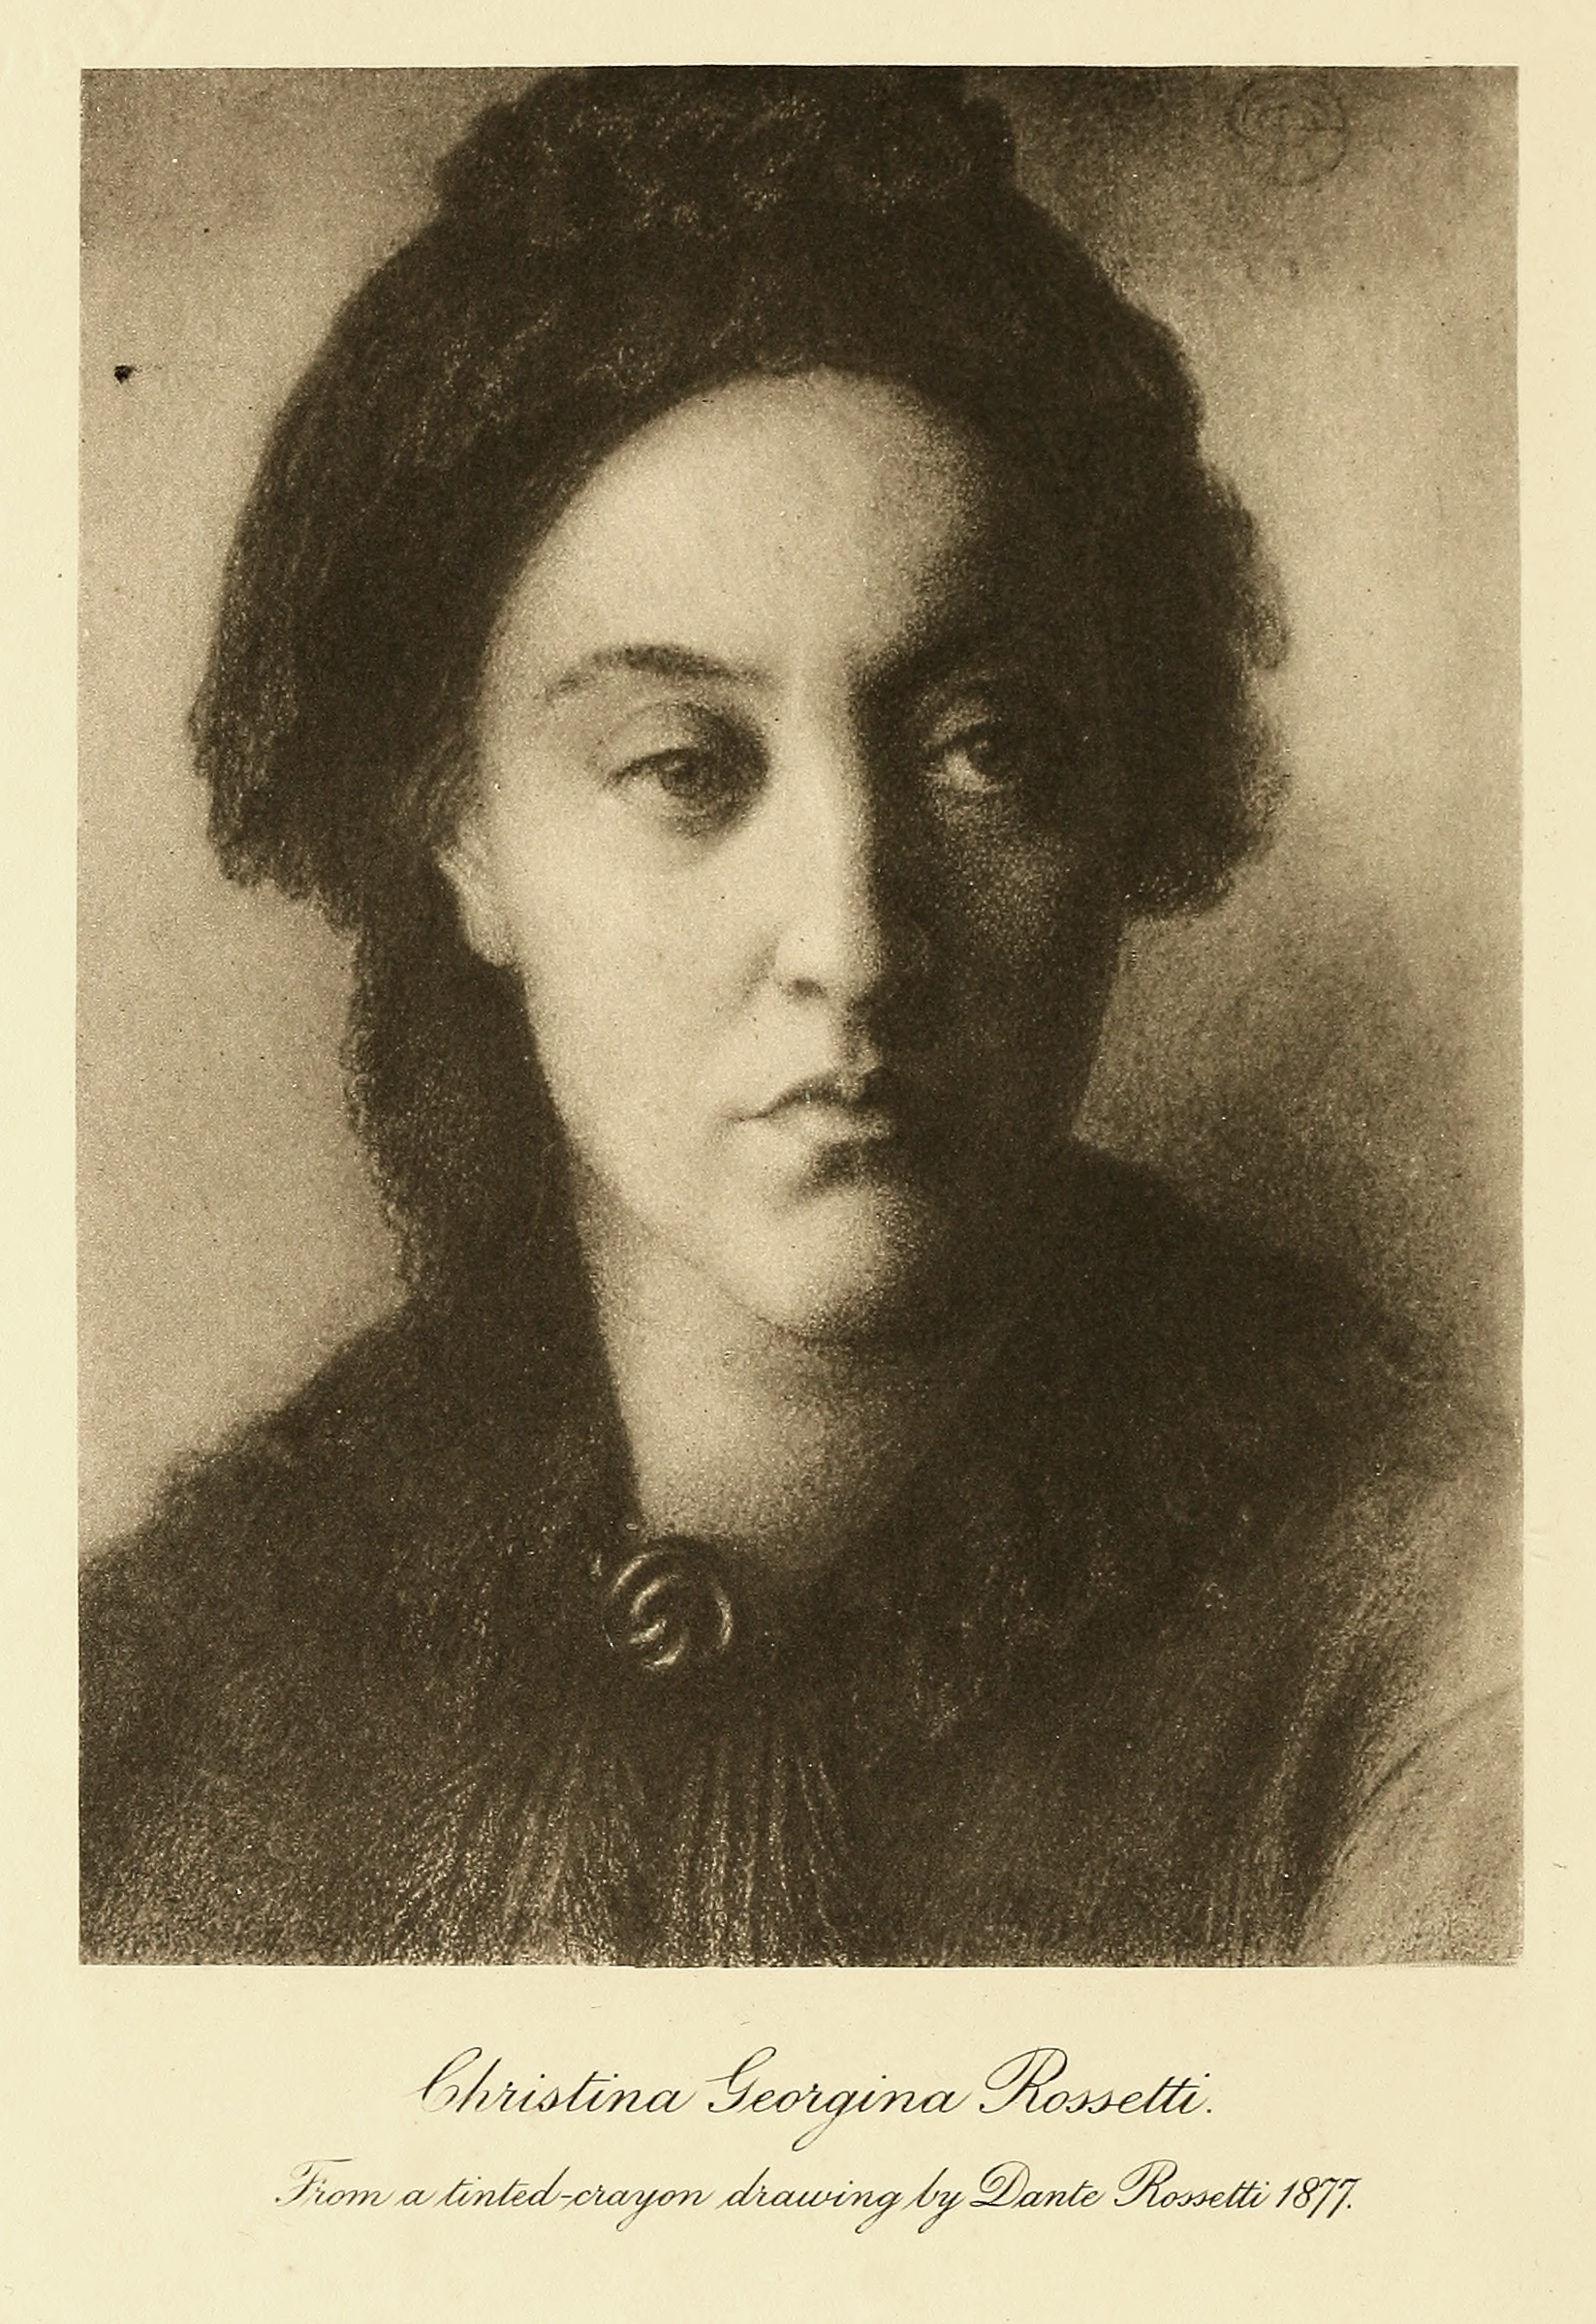 Christina Rossetti , in William Michael Rossetti,  The Family Letters of Christina Georgina Rossetti  (London: Brown, Langham & Co., 1908).